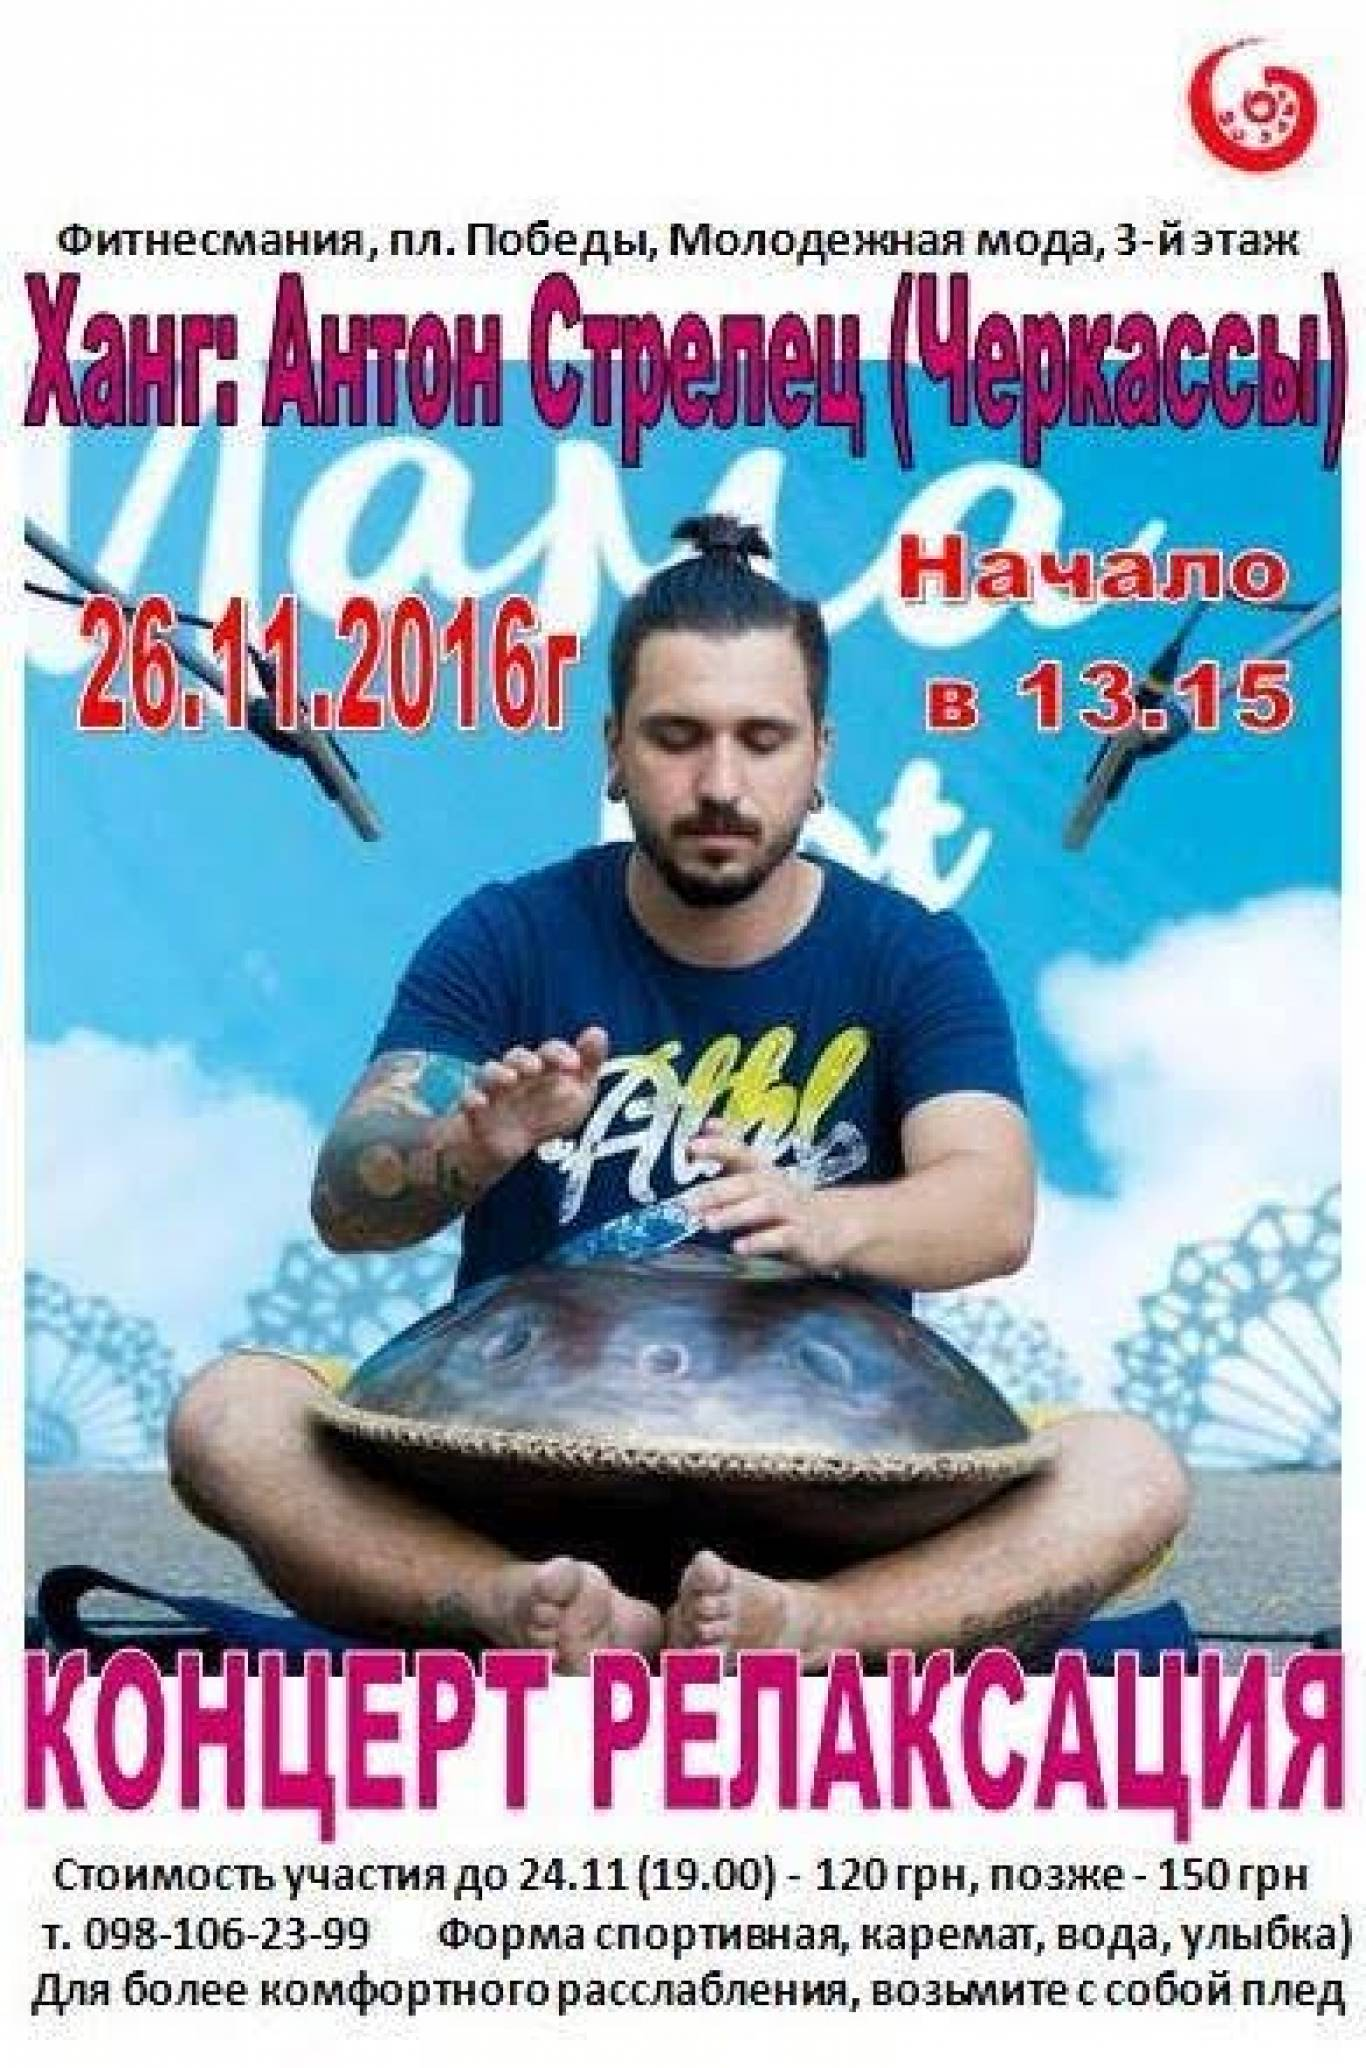 Концерт-релаксация: Антон Стрелец (Черкассы)